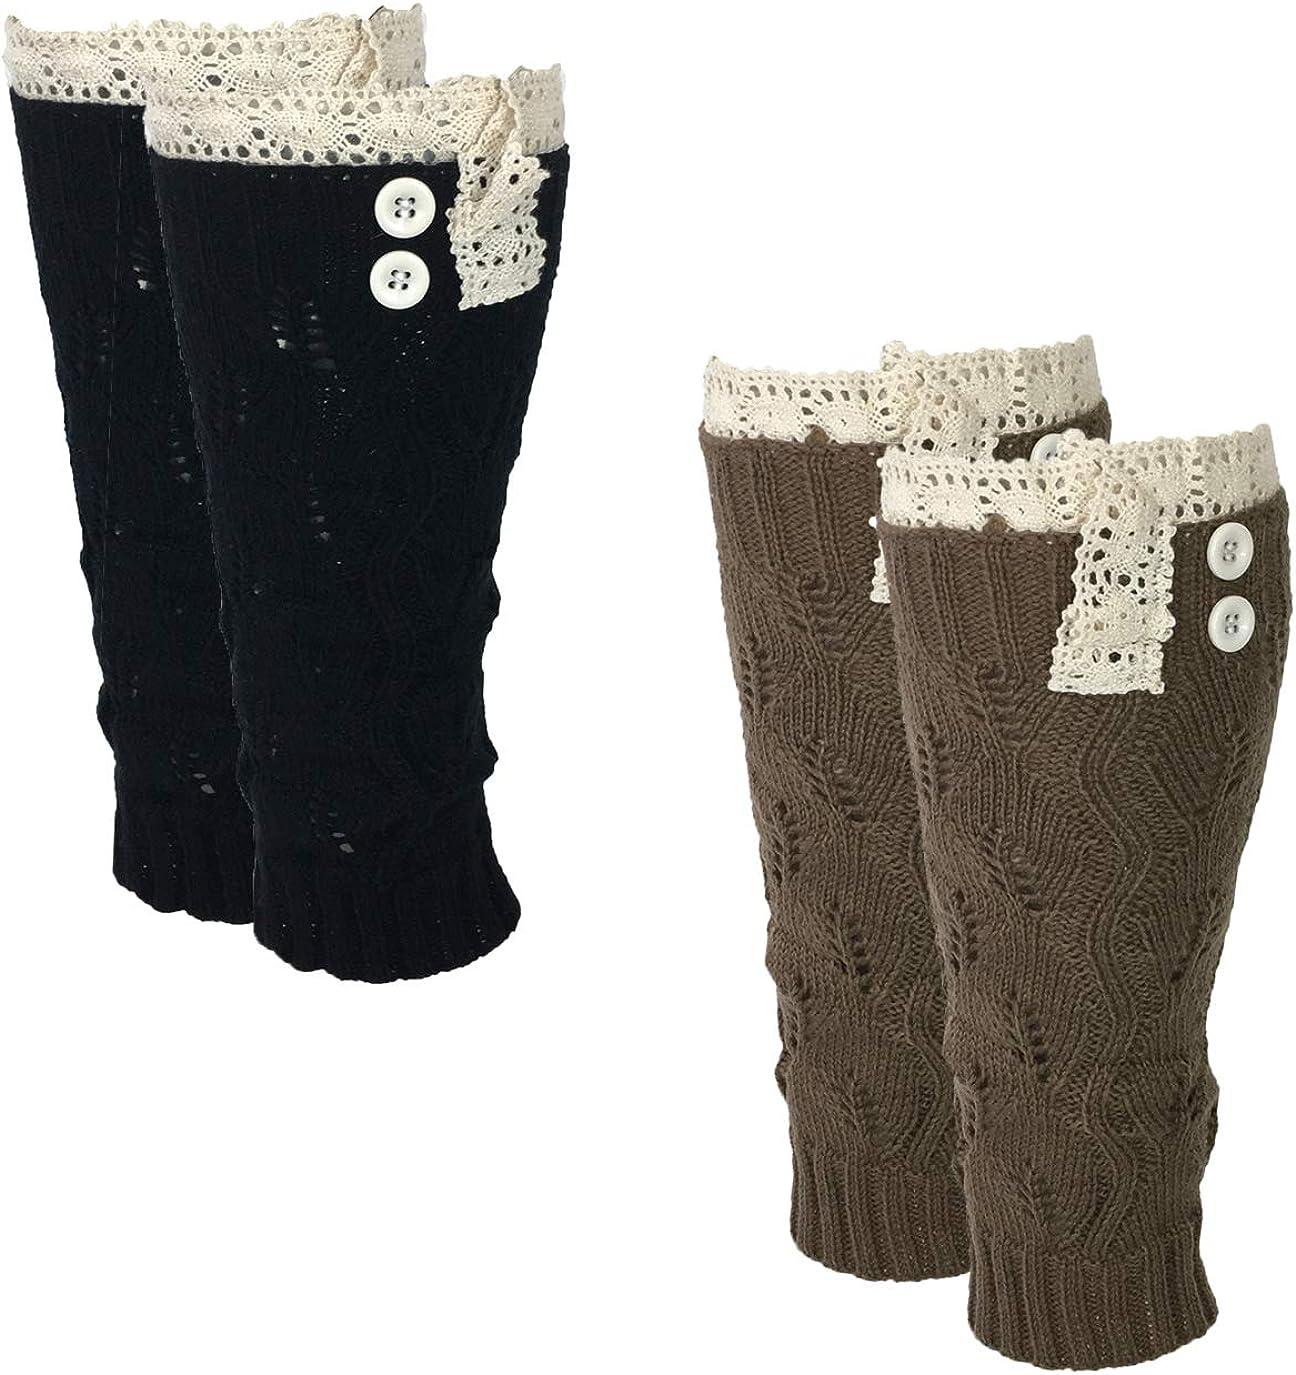 Fashion Culture Women's Crochet Lace Trim Leg Warmers Boot Toppers Set of 2, Black Mocha